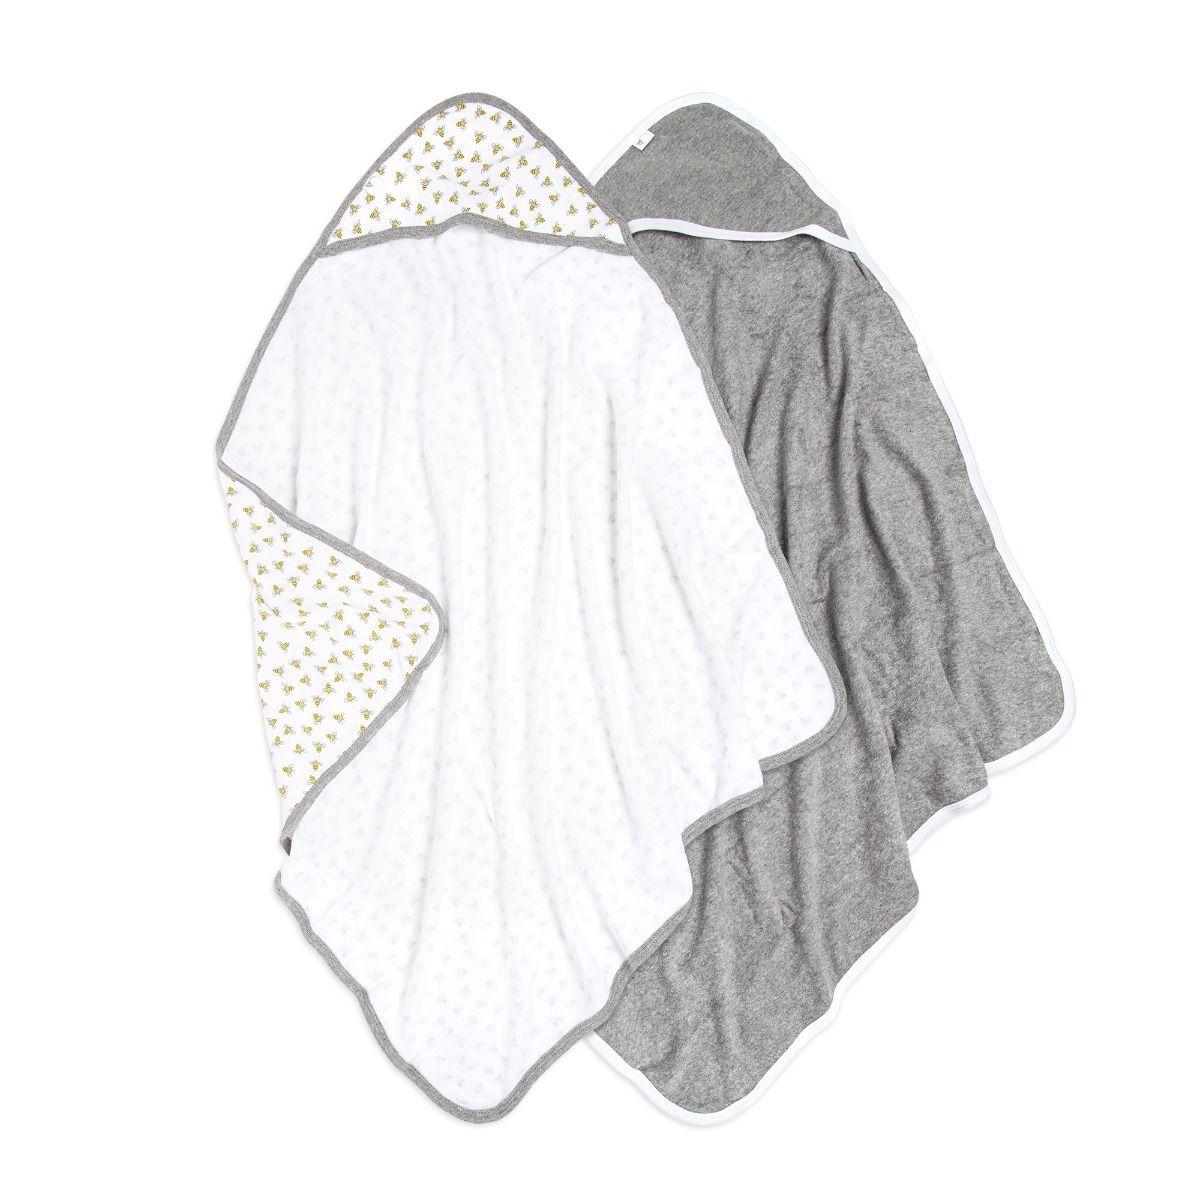 Baby Single Ply Honey Bee Organic Hooded Towel 2 Pack Hooded Baby Towel Baby Hooded Bath Towel Burts Bees Baby